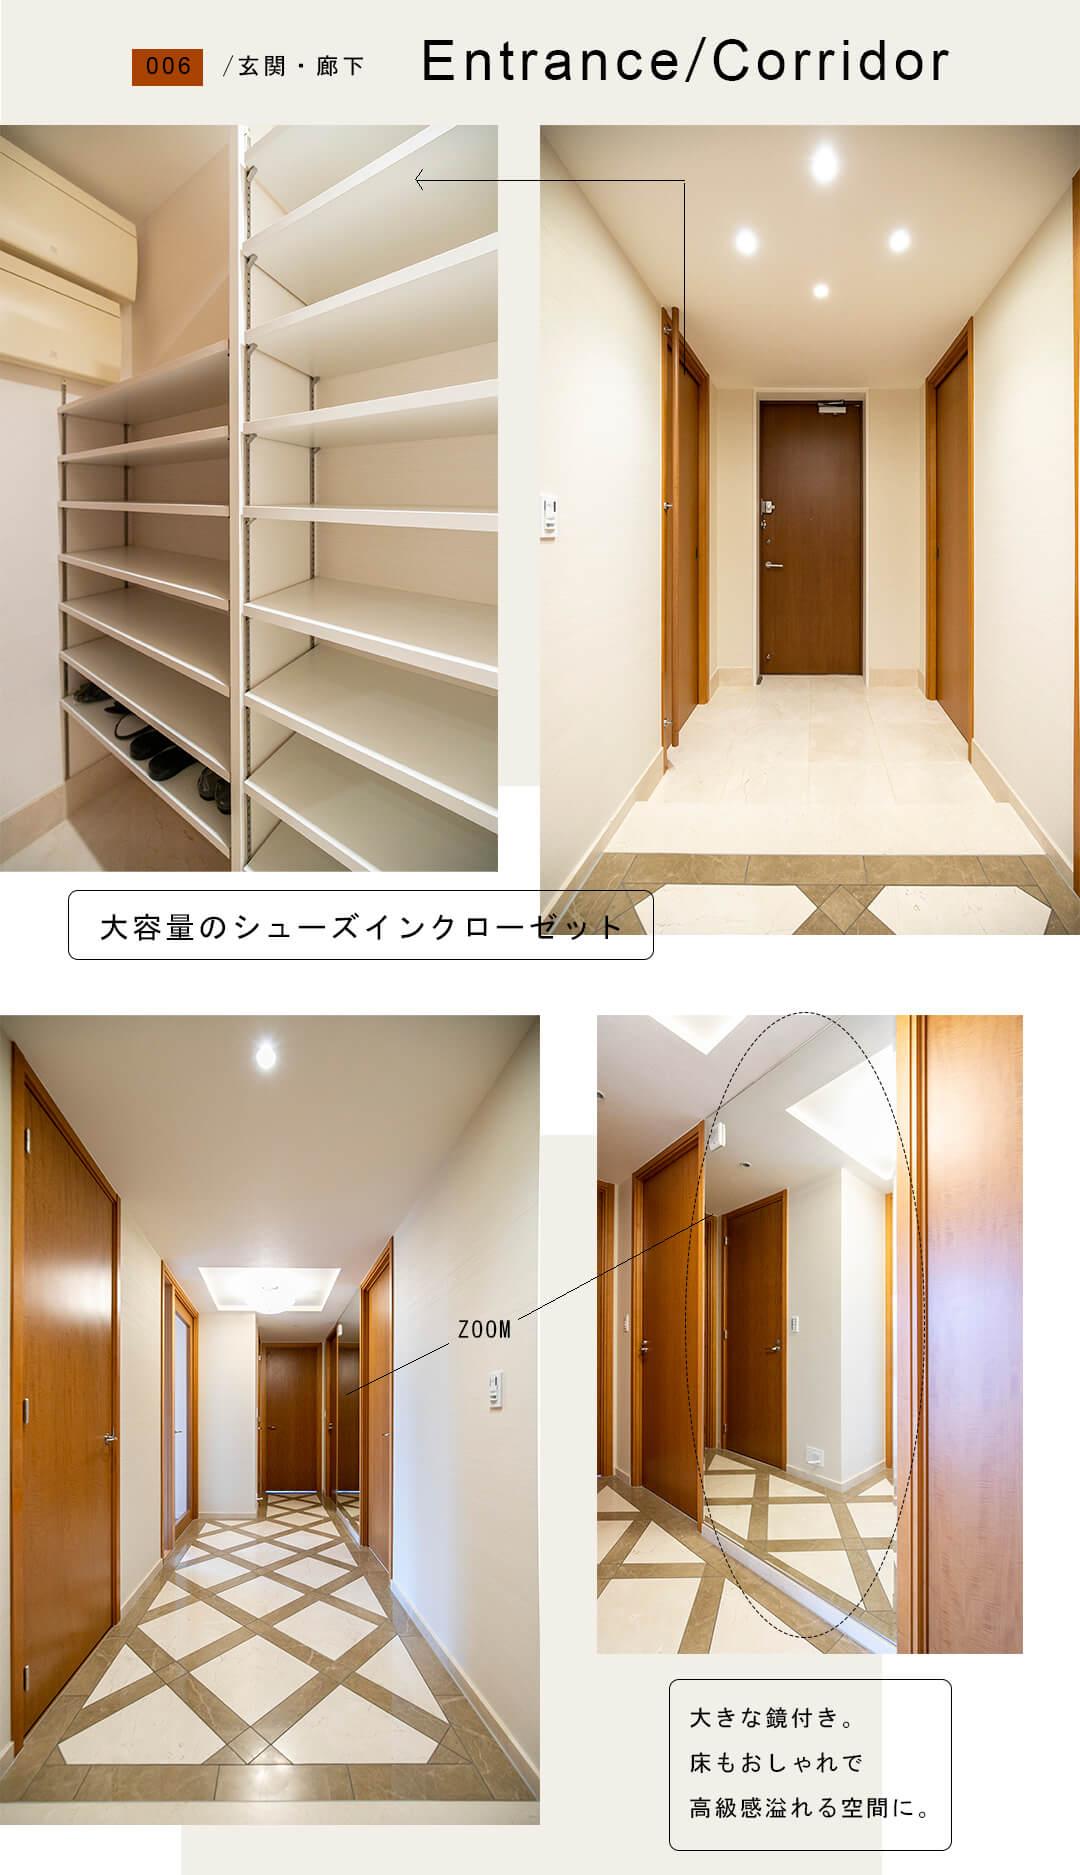 006玄関,廊下,Entrance,Corridor